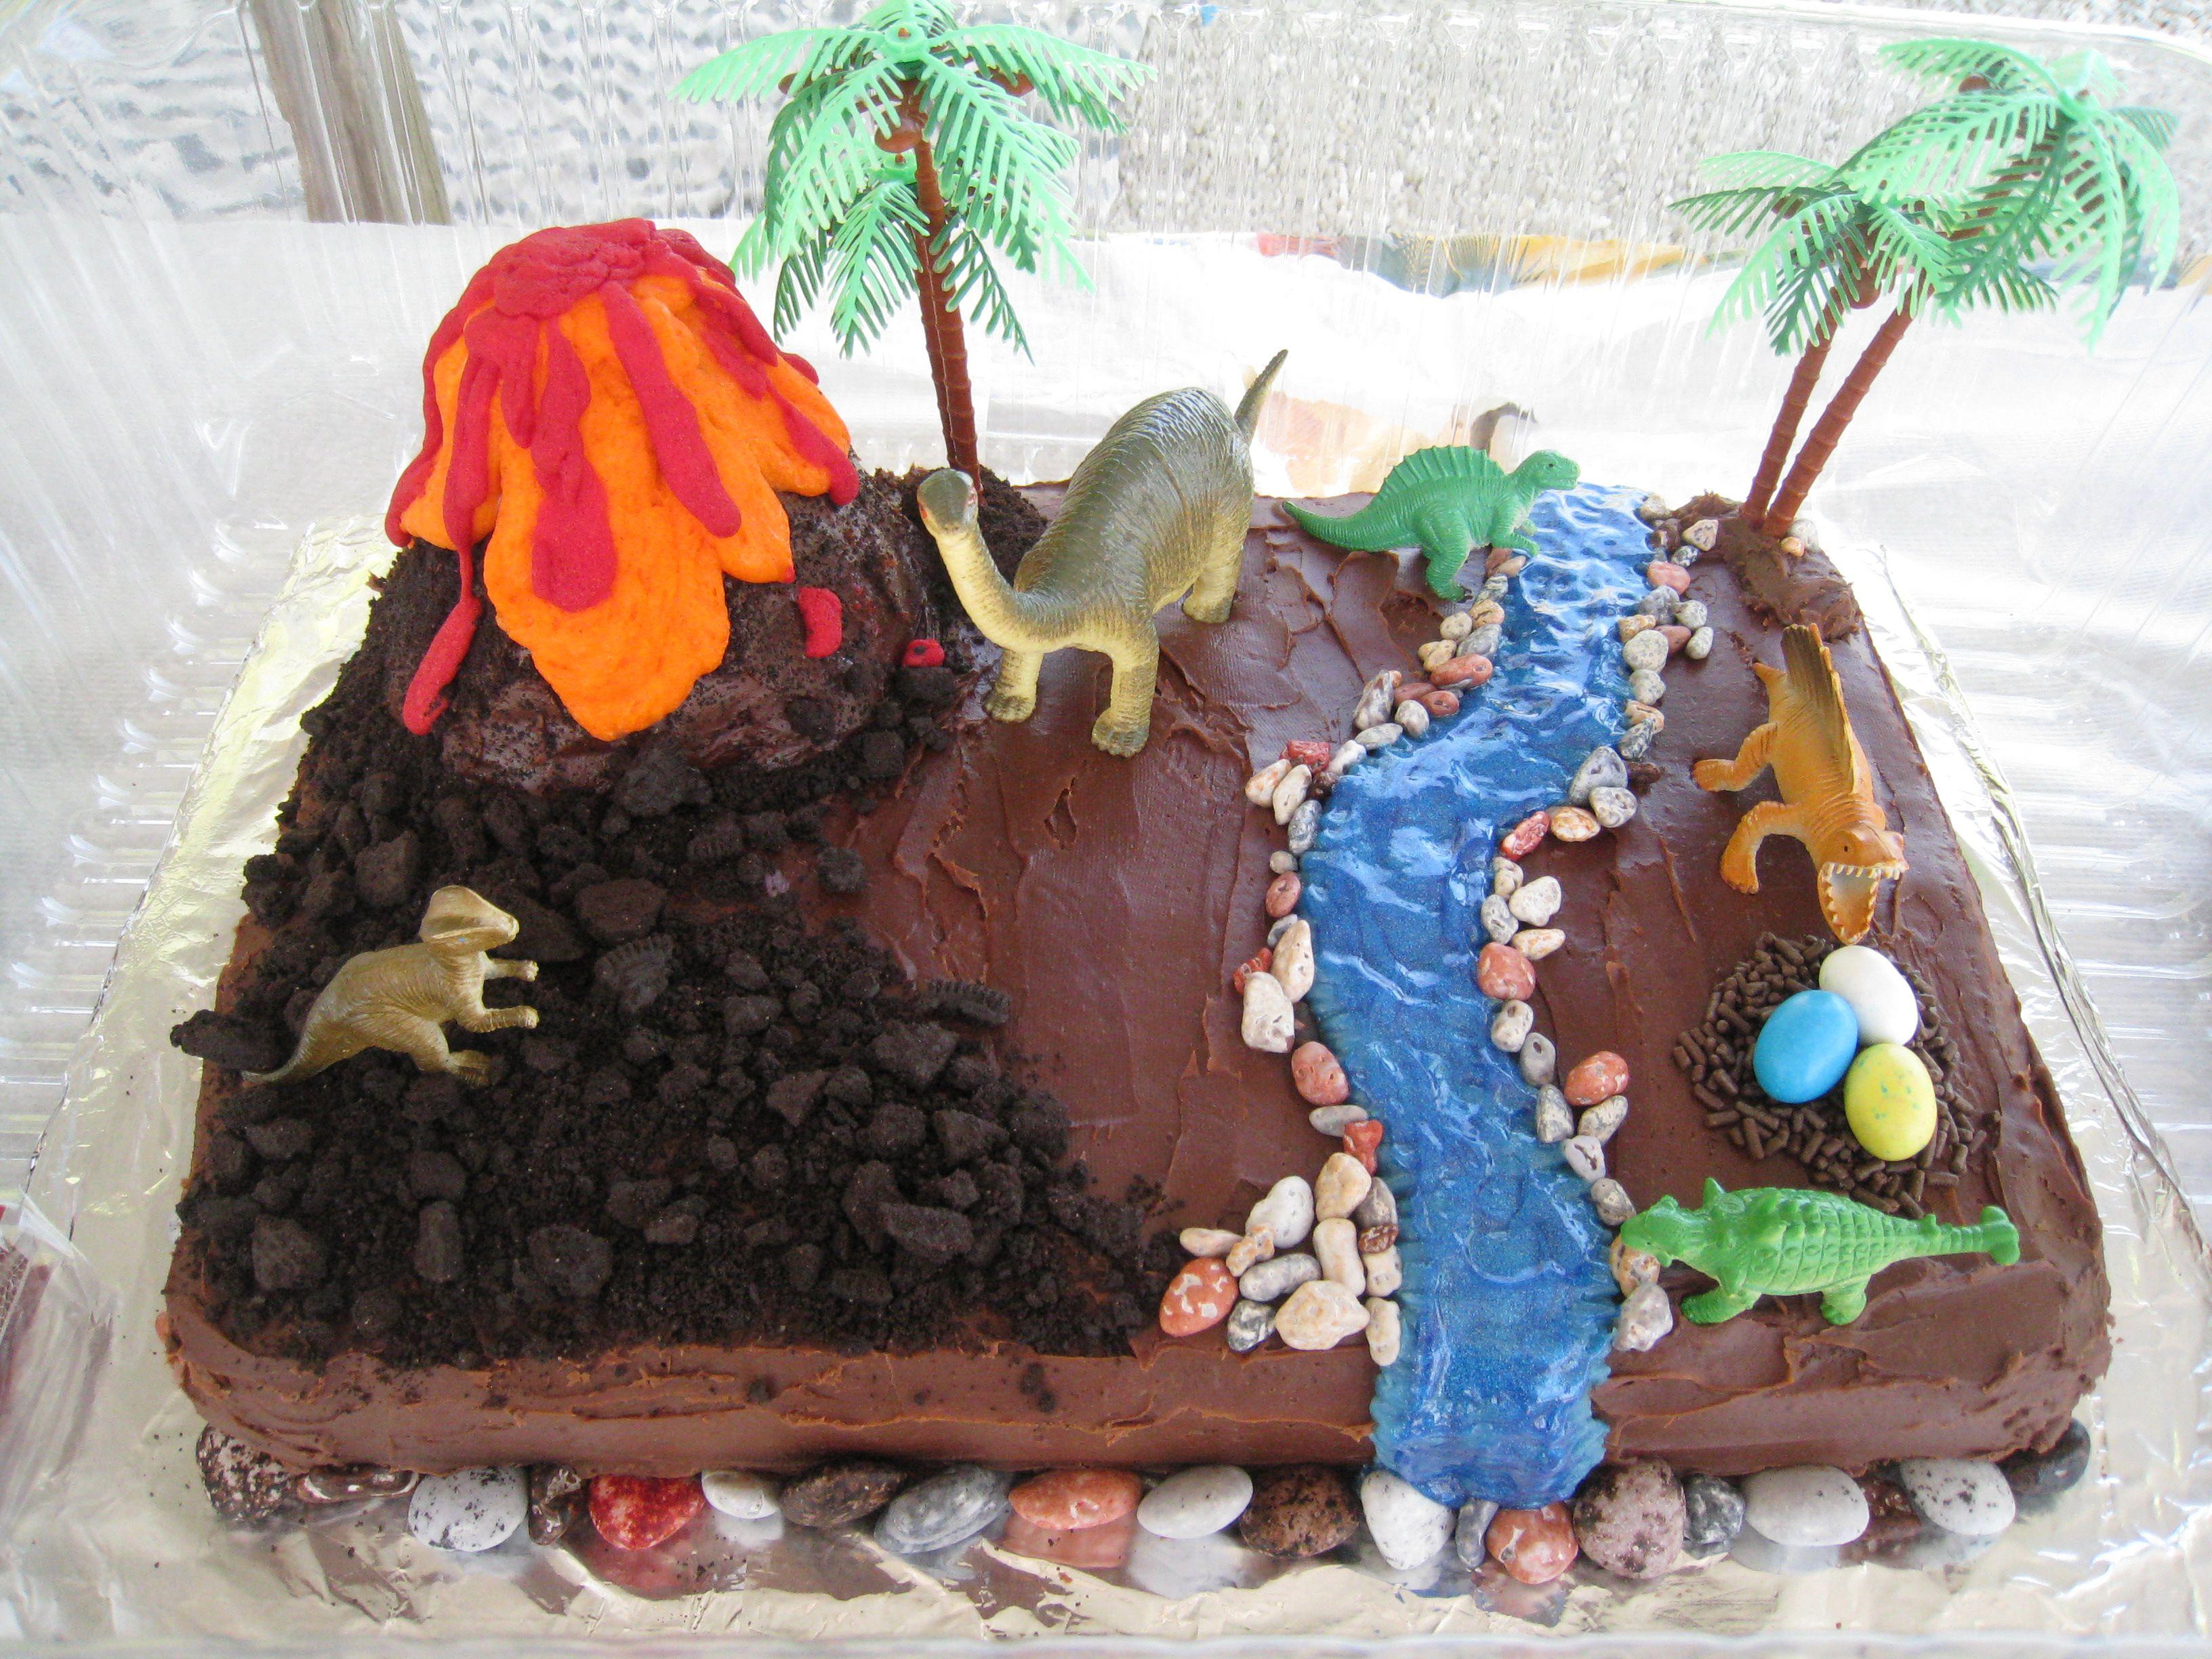 Peachy Dinosaur Cake Rice Crispies For Rocks Along Stream Oreo Crumbles Personalised Birthday Cards Veneteletsinfo